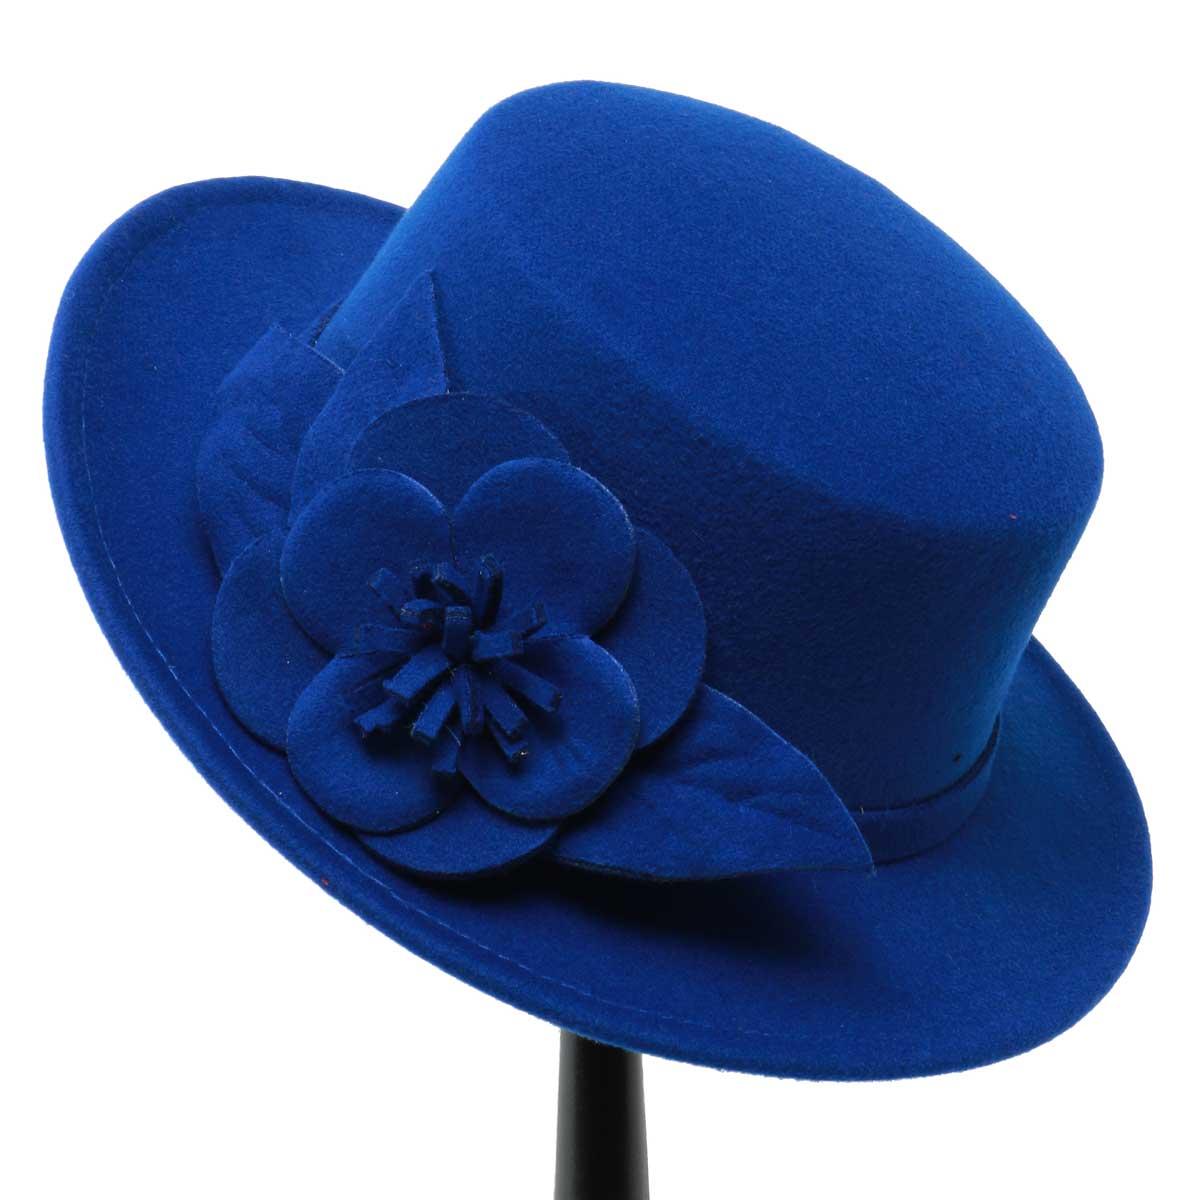 BLUE GAINSBOROUGH HAT 50sp